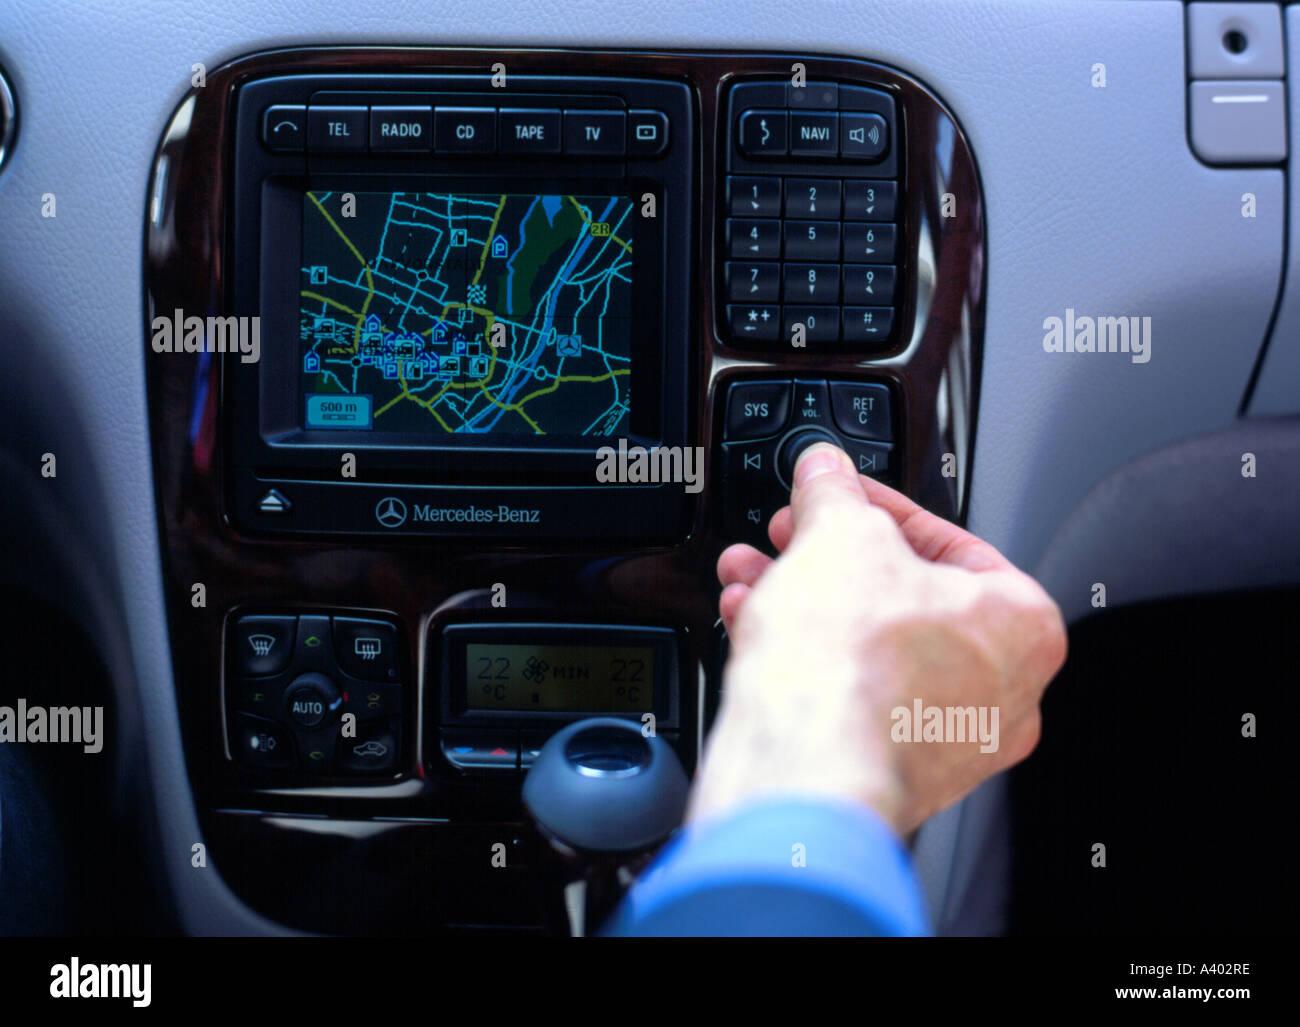 car navigation system traffic radio - Stock Image